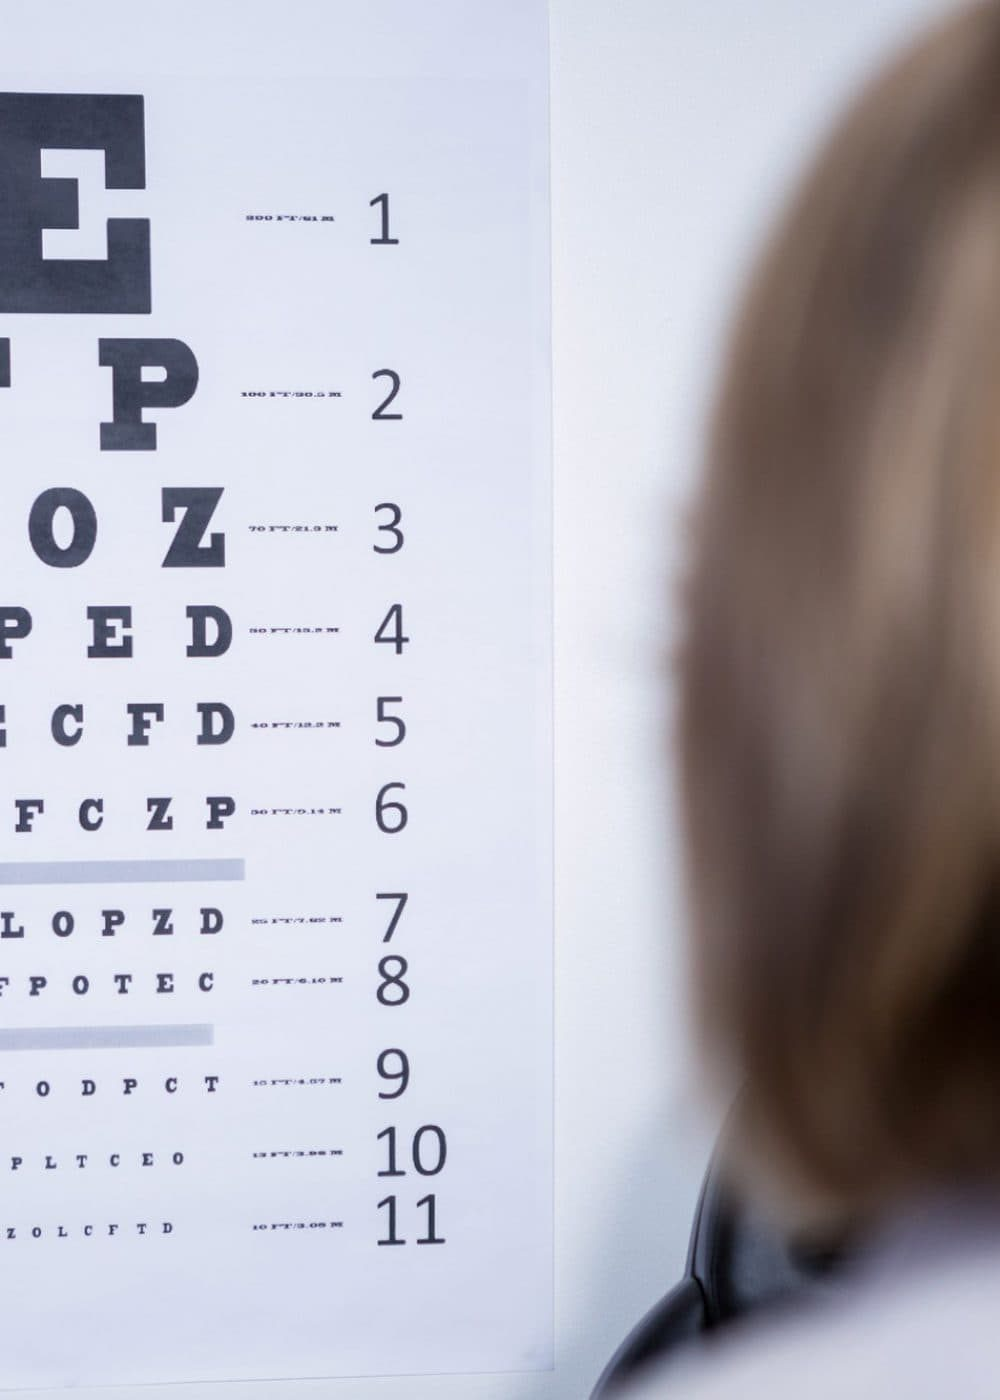 optometrist-looking-at-eye-chart-pcpj4diypa1t2mms2ay0cgh2kqm30jbhkrljs7zflc-pichi@2x